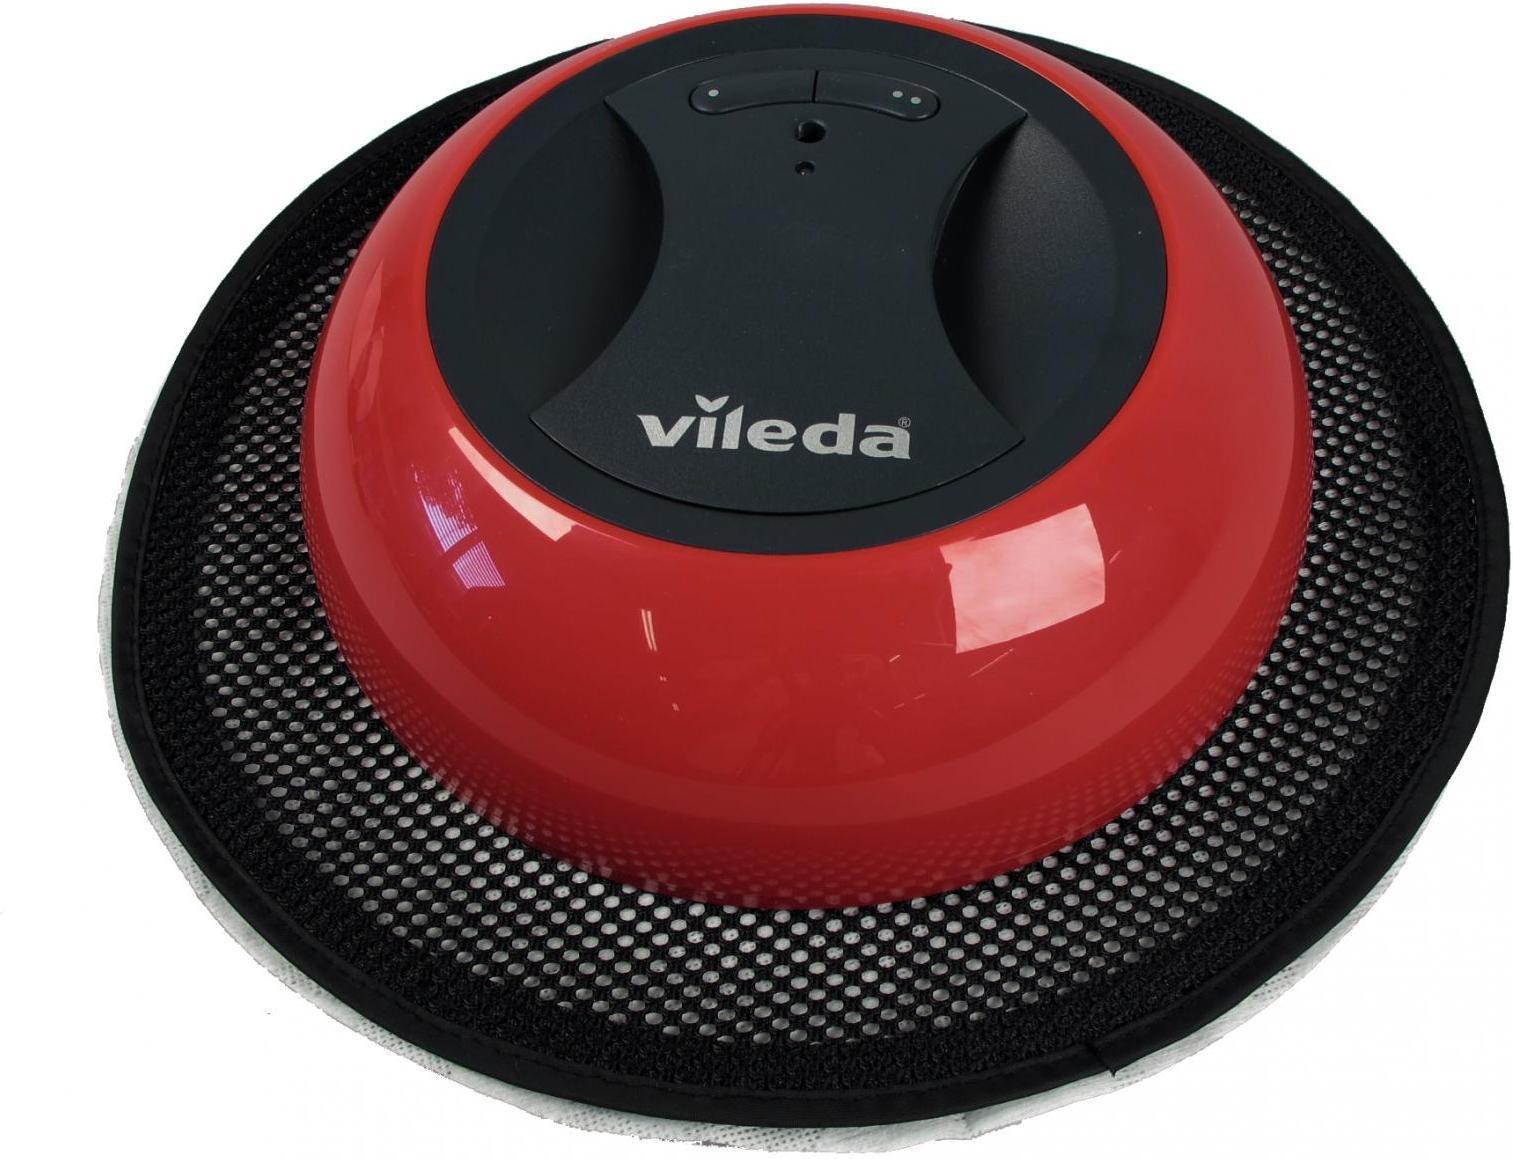 Vileda Virobi Robot Mop 136134 Opinie Użytkowników Opineopl